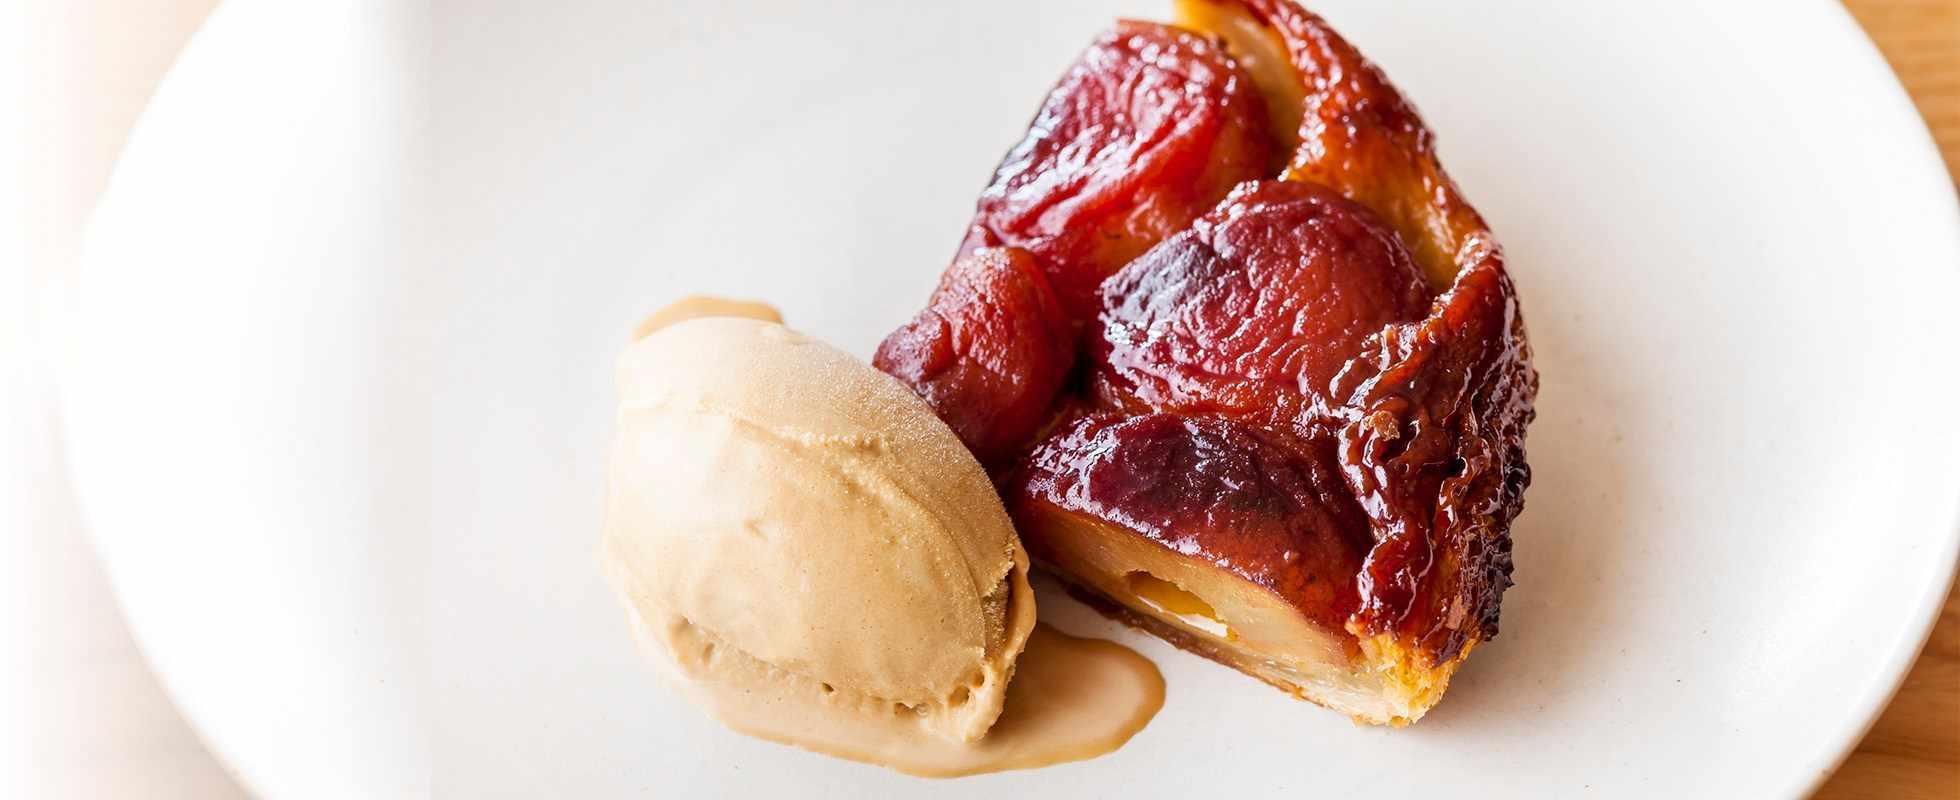 Spiced apple tart tatin recipe